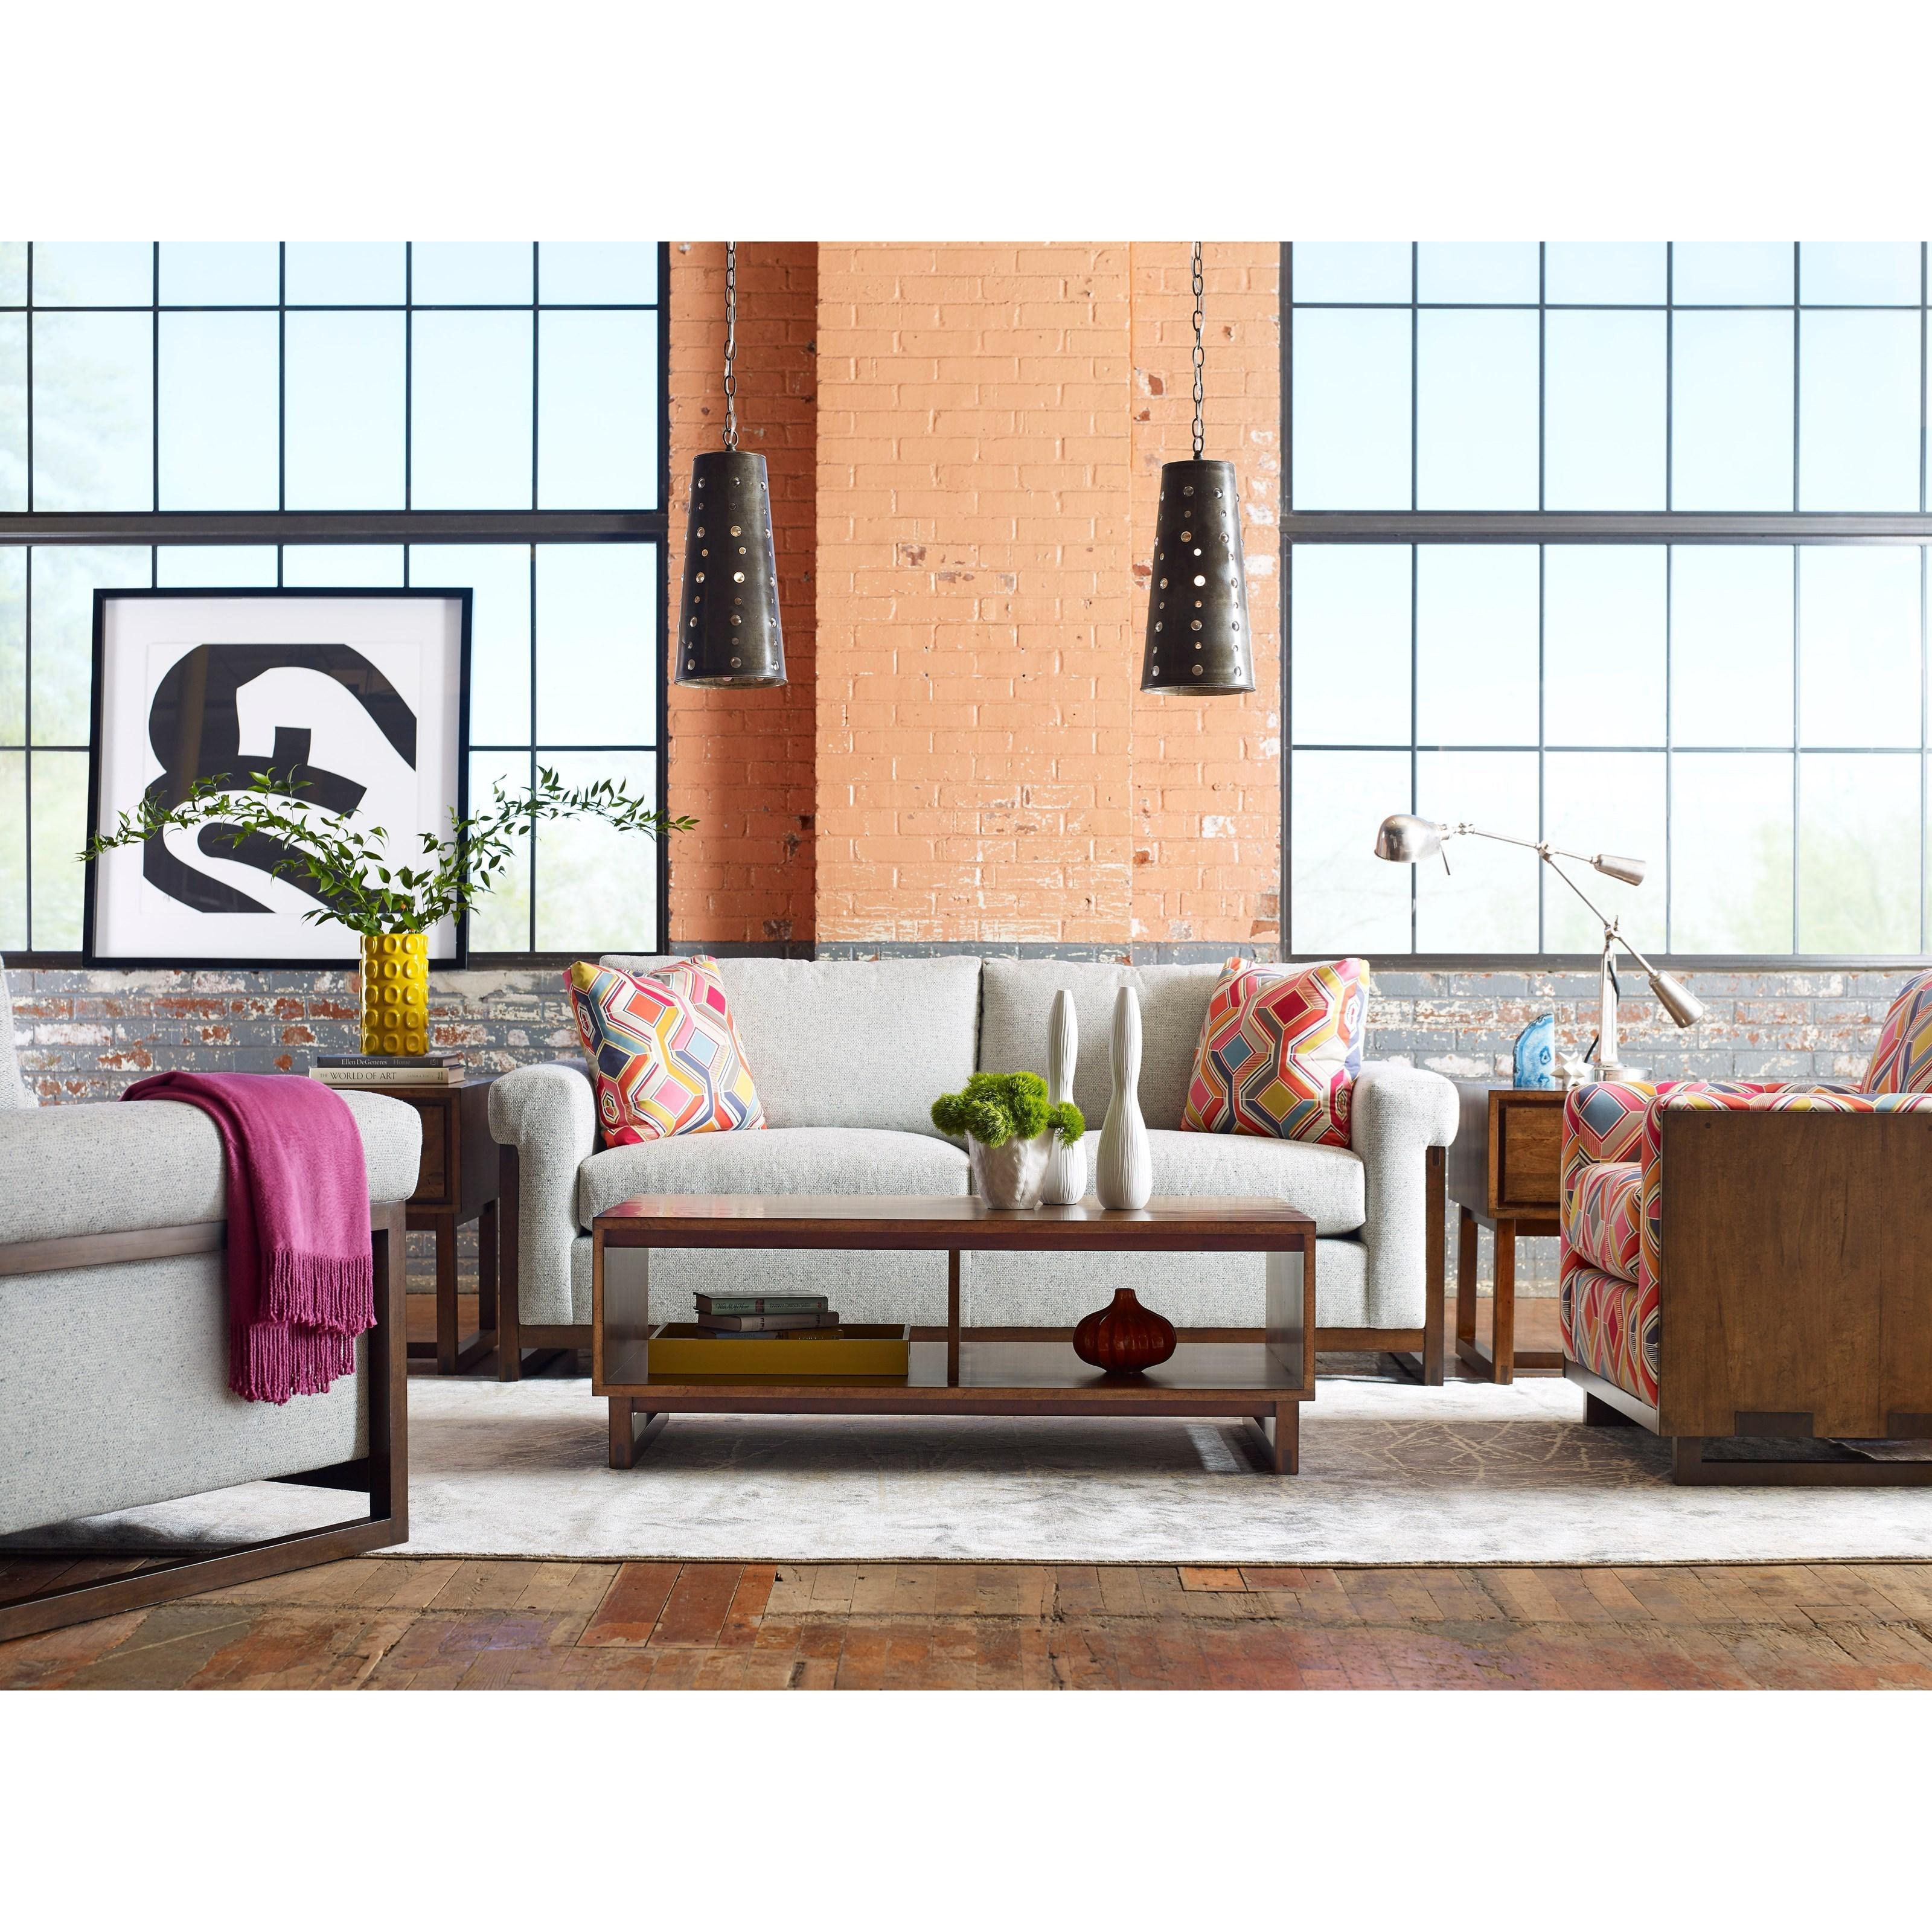 Kincaid Furniture Traverse 660-910 Carpenter Modern